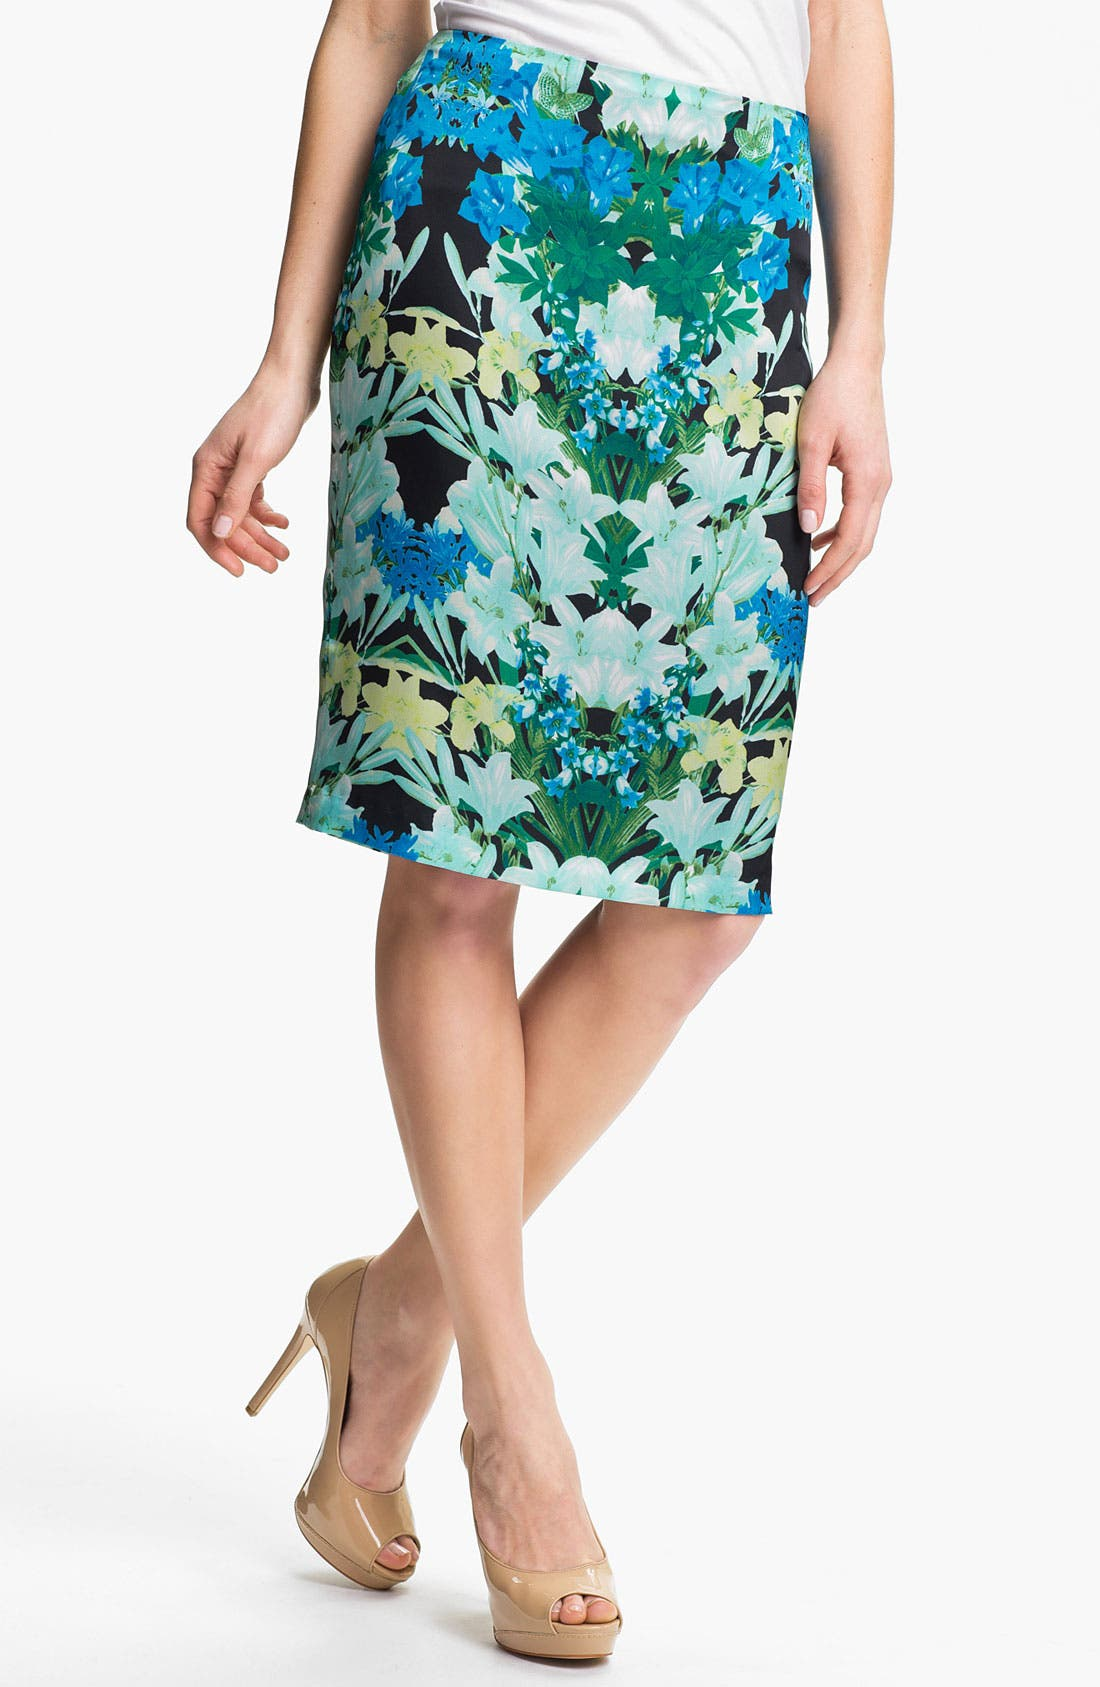 Alternate Image 1 Selected - Vince Camuto 'Spring Garlands' Pencil Skirt